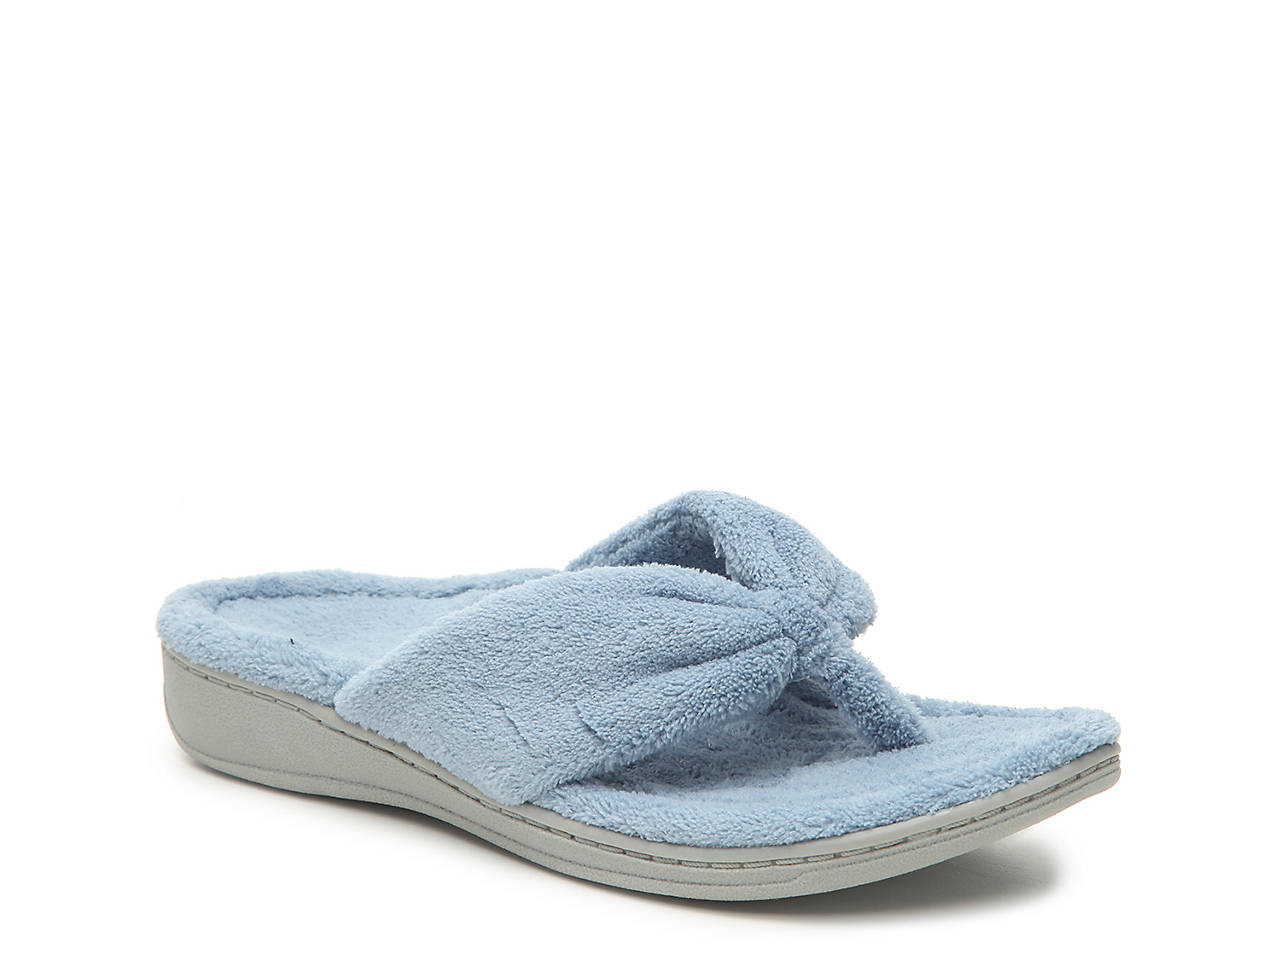 2887f8fbf8f Vionic Gracie Thong Slipper Women s Shoes